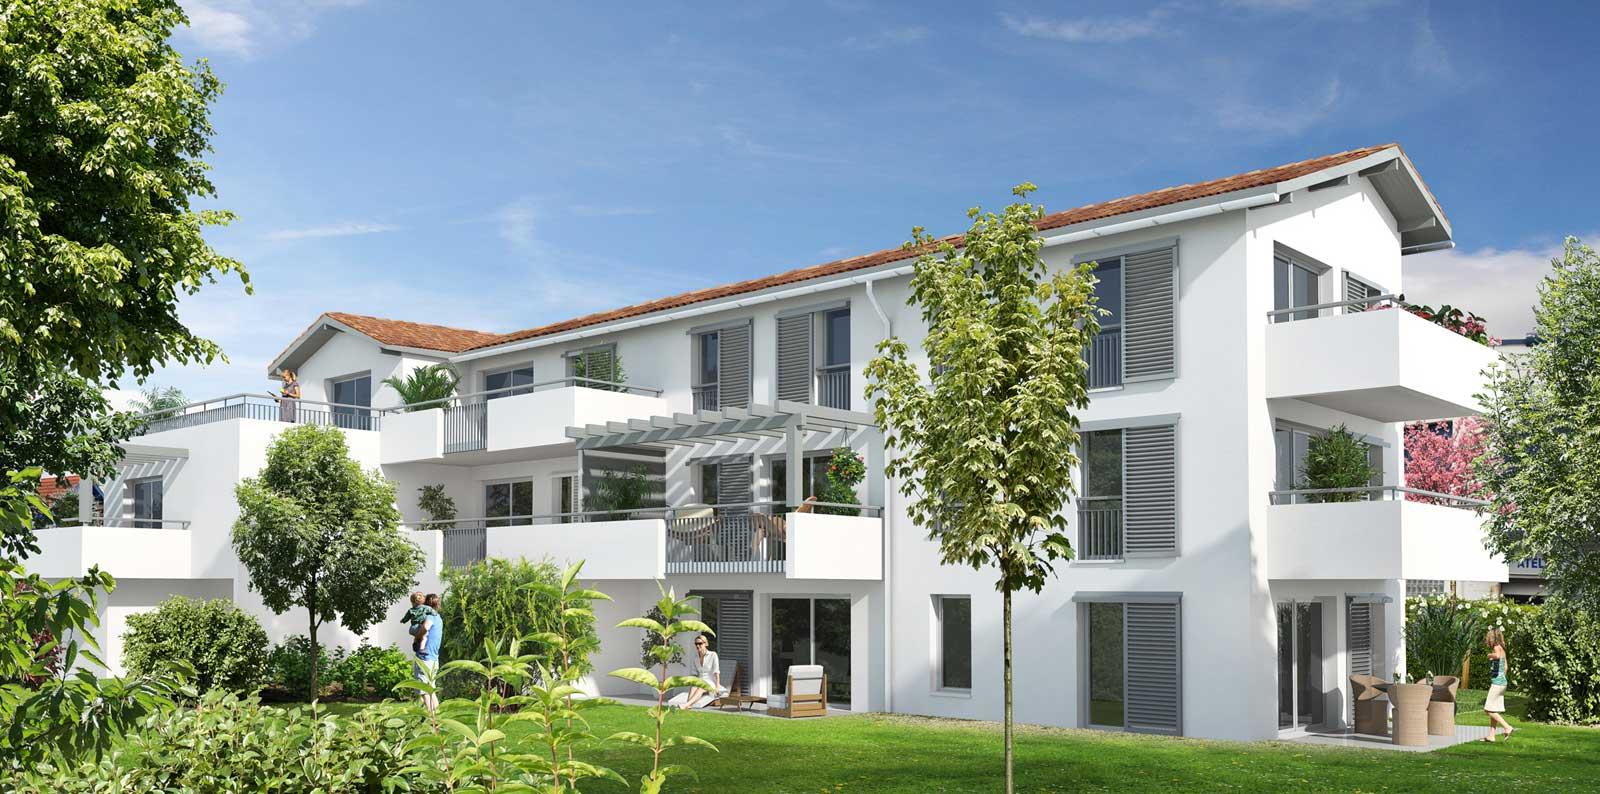 villa paloma biarritz aog architectes. Black Bedroom Furniture Sets. Home Design Ideas